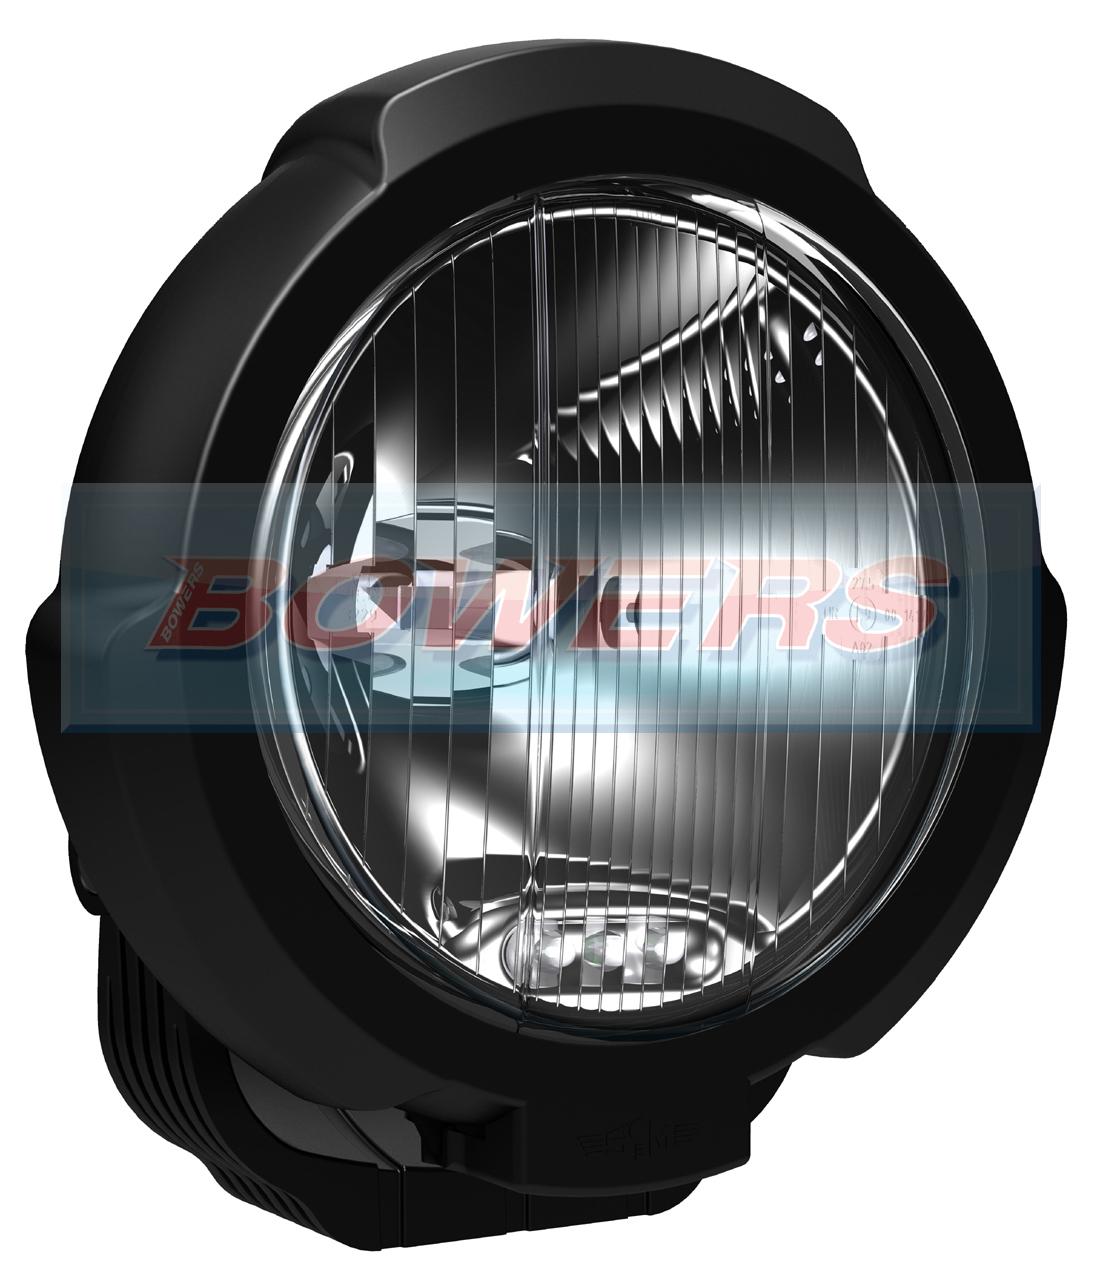 Sim 3229 12v 24v 7 Black Round Halogen Spot Driving Light Lamp With Spotlight Wiring Diagram 32291000060 Schematic